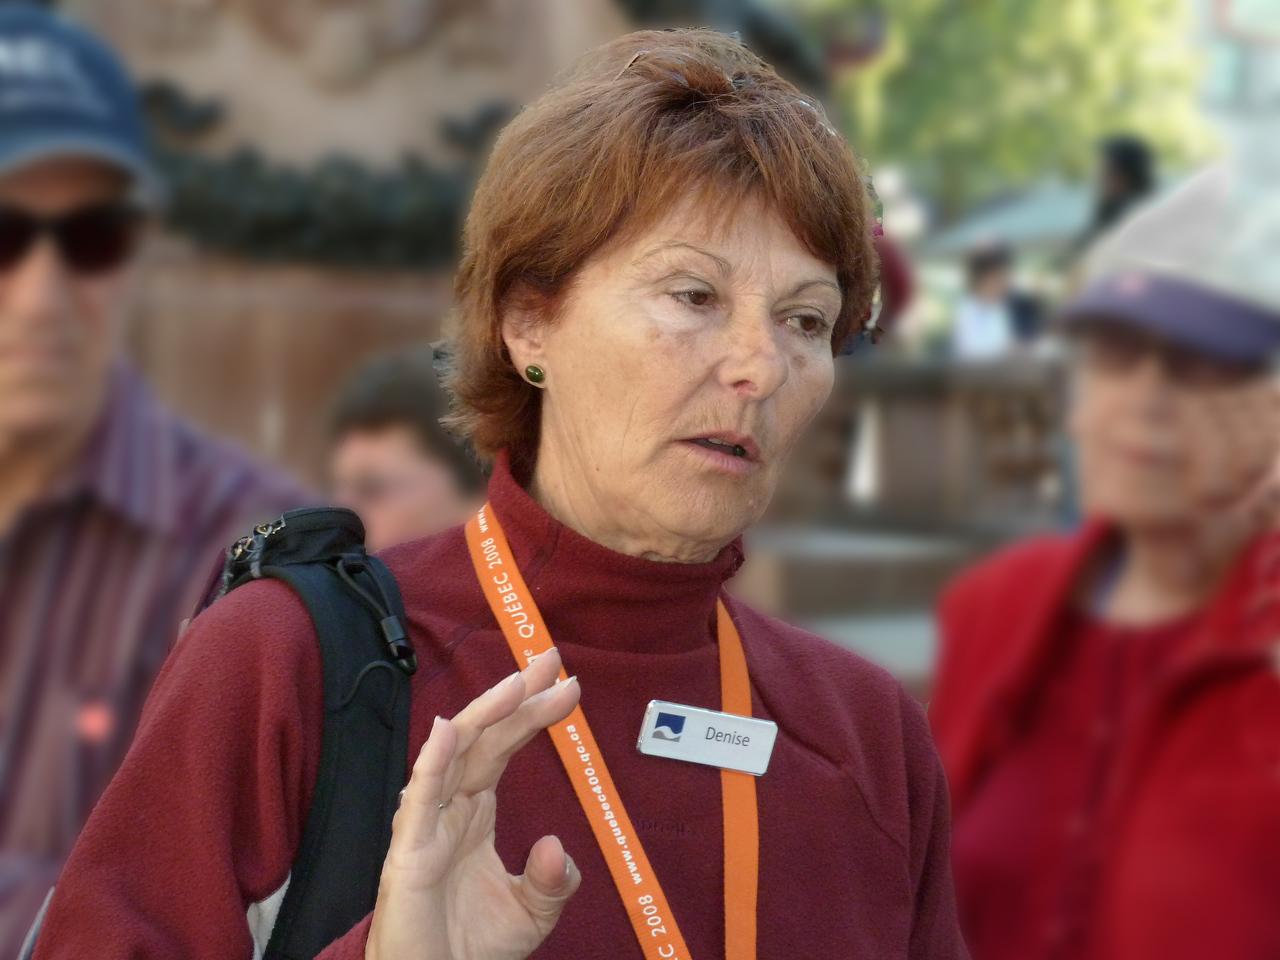 Walking Tour Guide - Denise